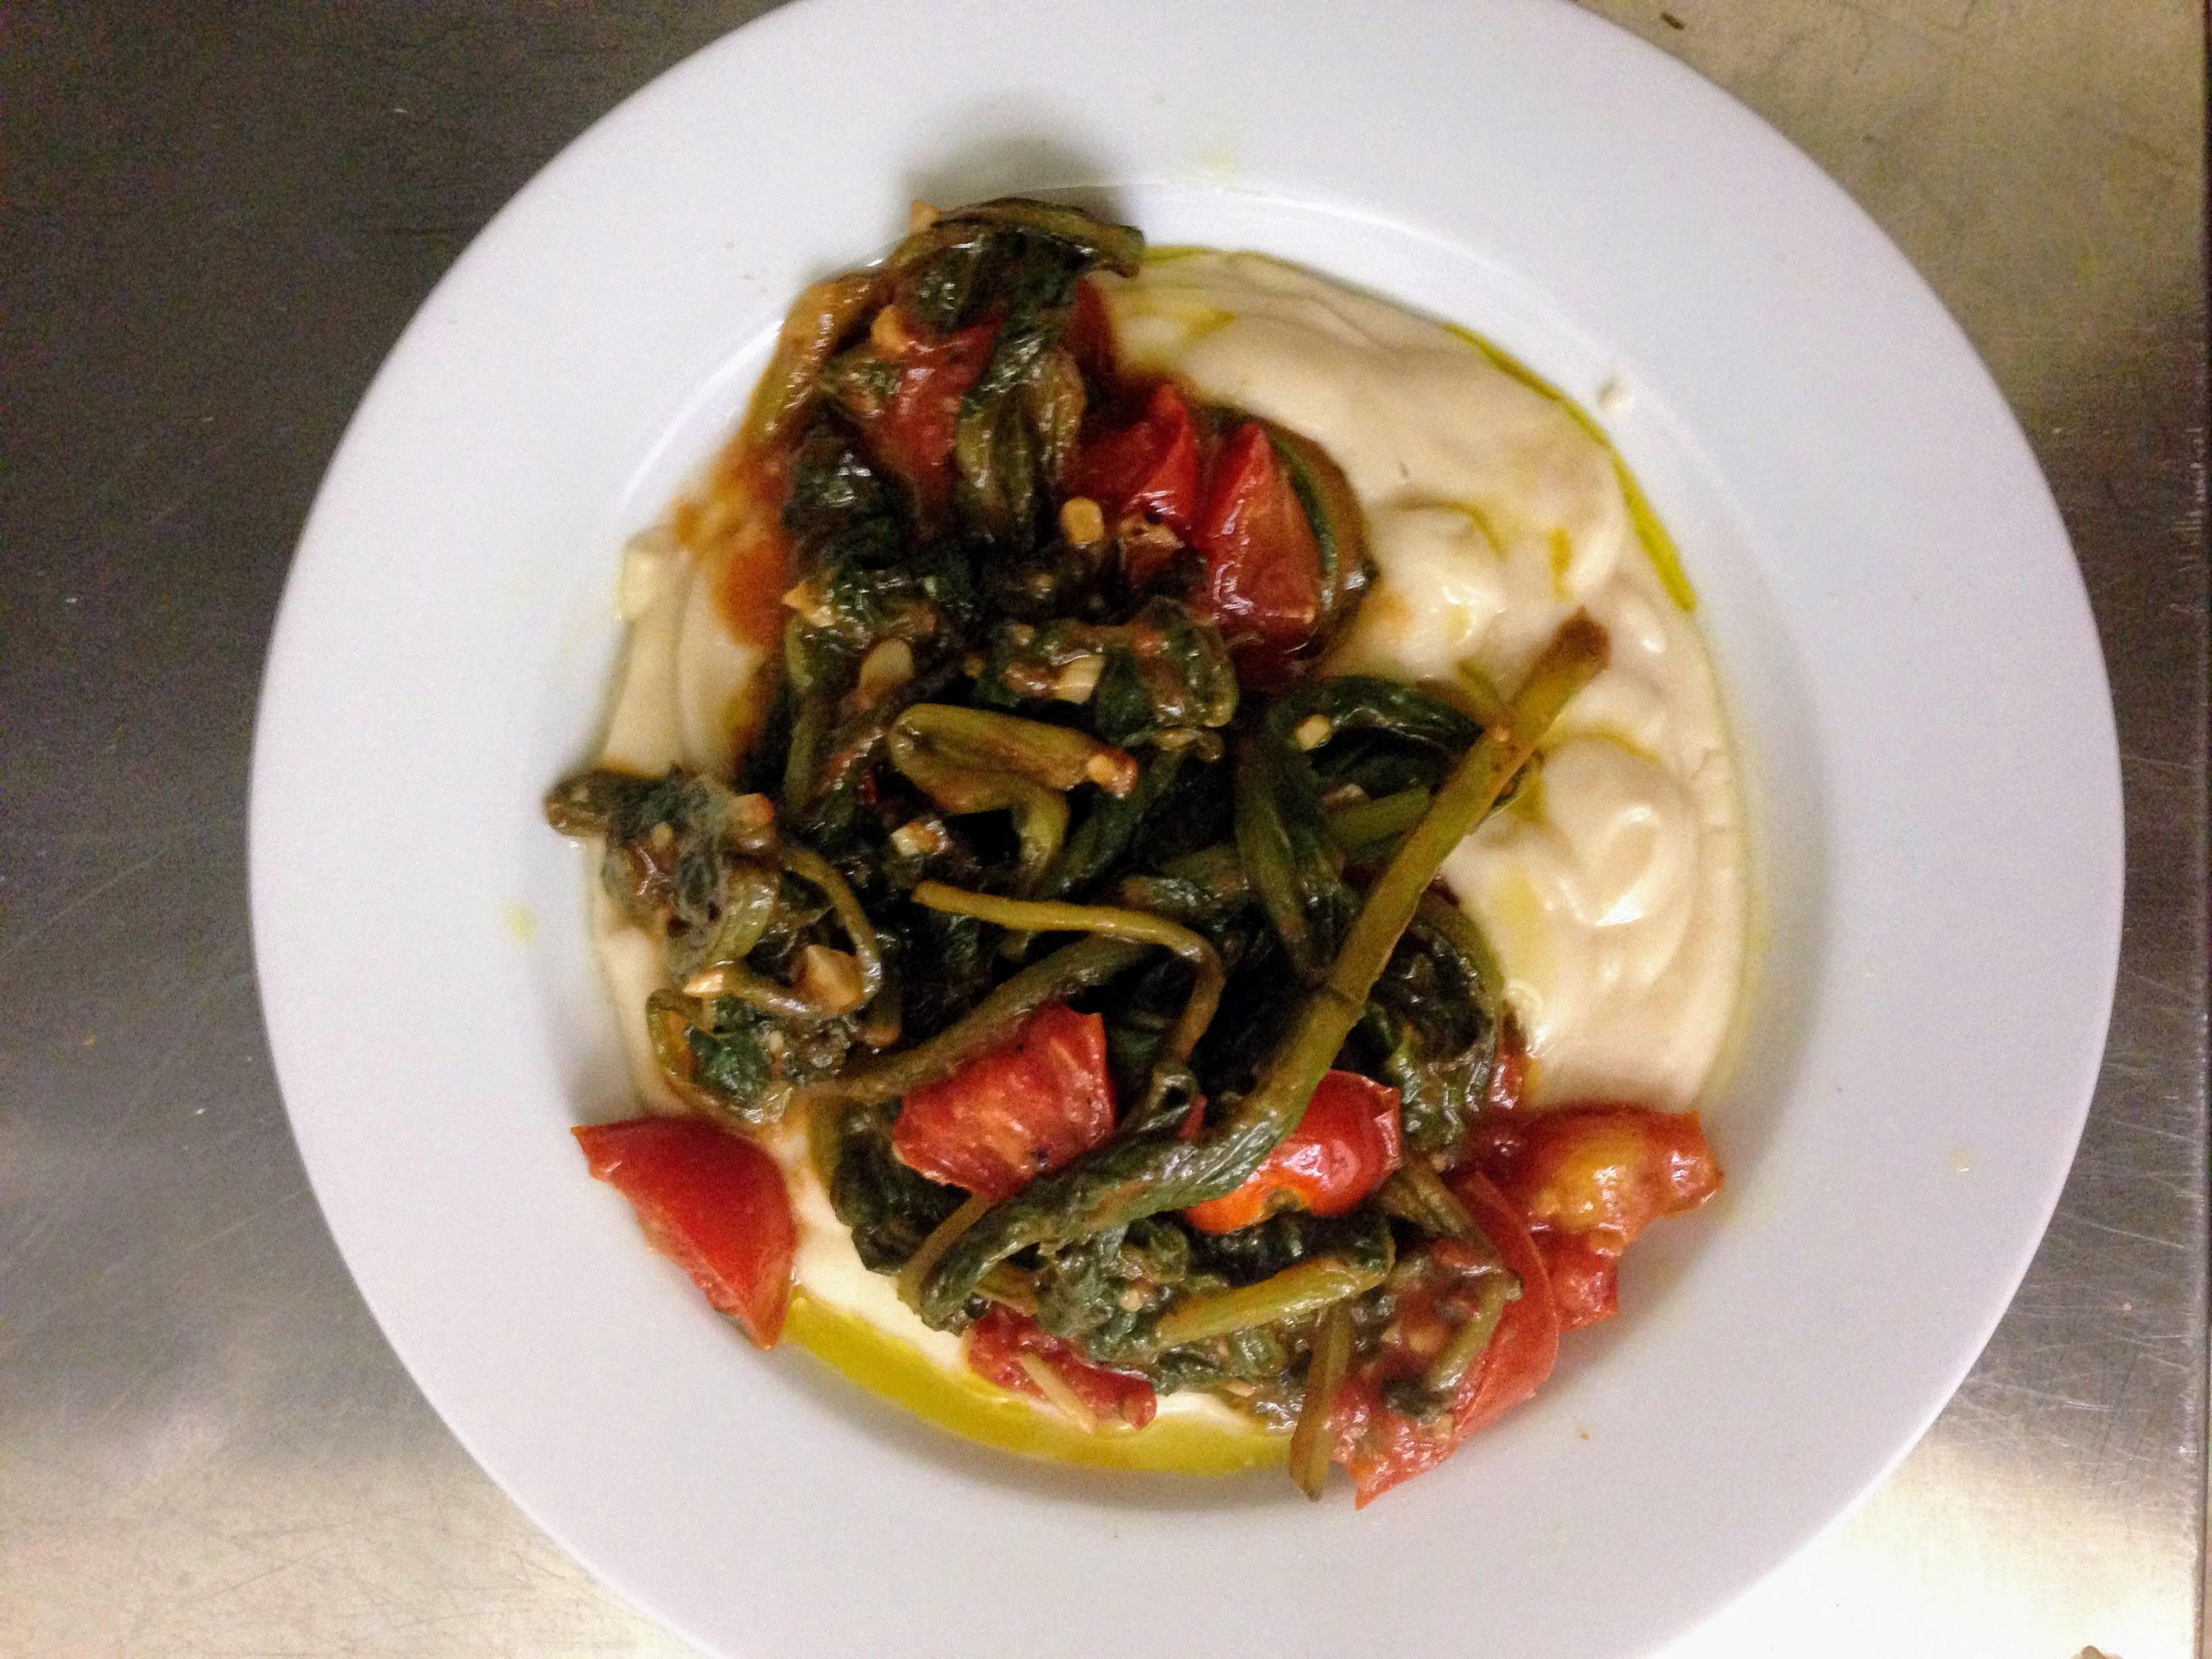 Puglia Bari Italy food tips travel tips travel blog things to eat traditional Italian dishes food crema di fagioli